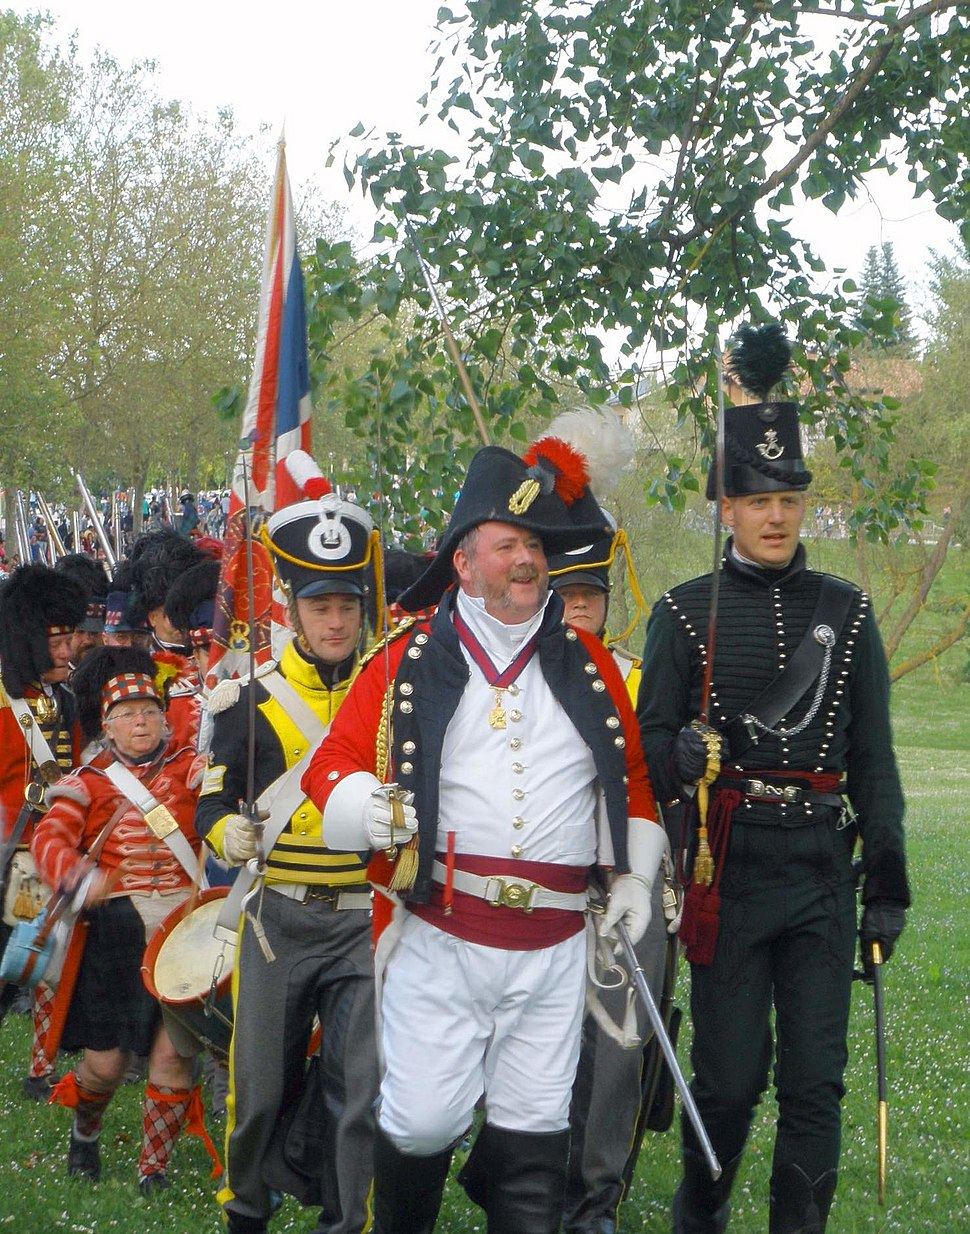 Vitoria - Recreación histórica de la Batalla de Vitoria, bicentenario 1813-2013 019